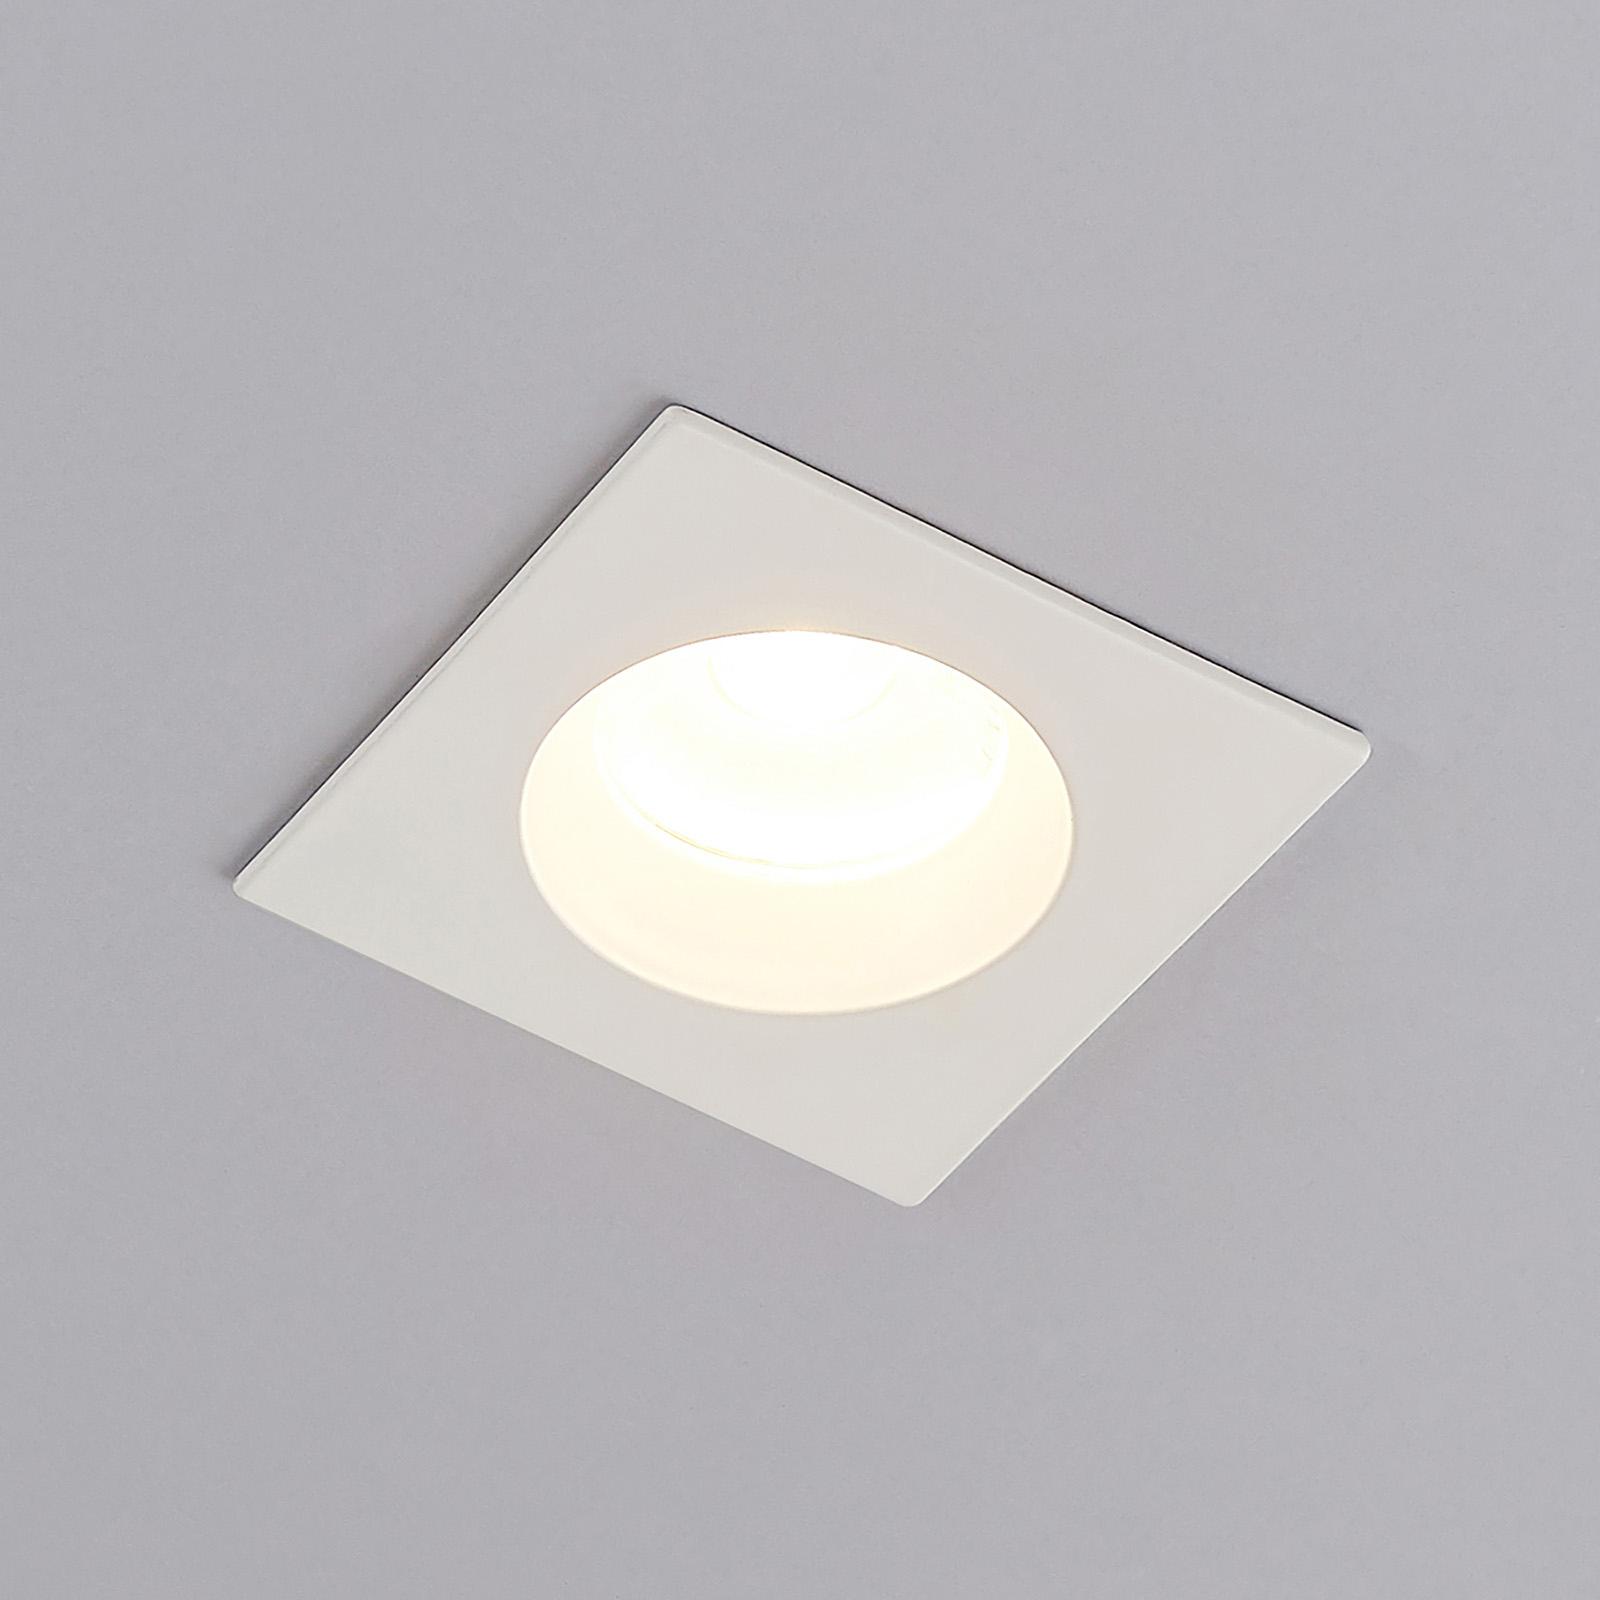 Arcchio Urdin LED-kohdevalo kulmikas IP65, 4W